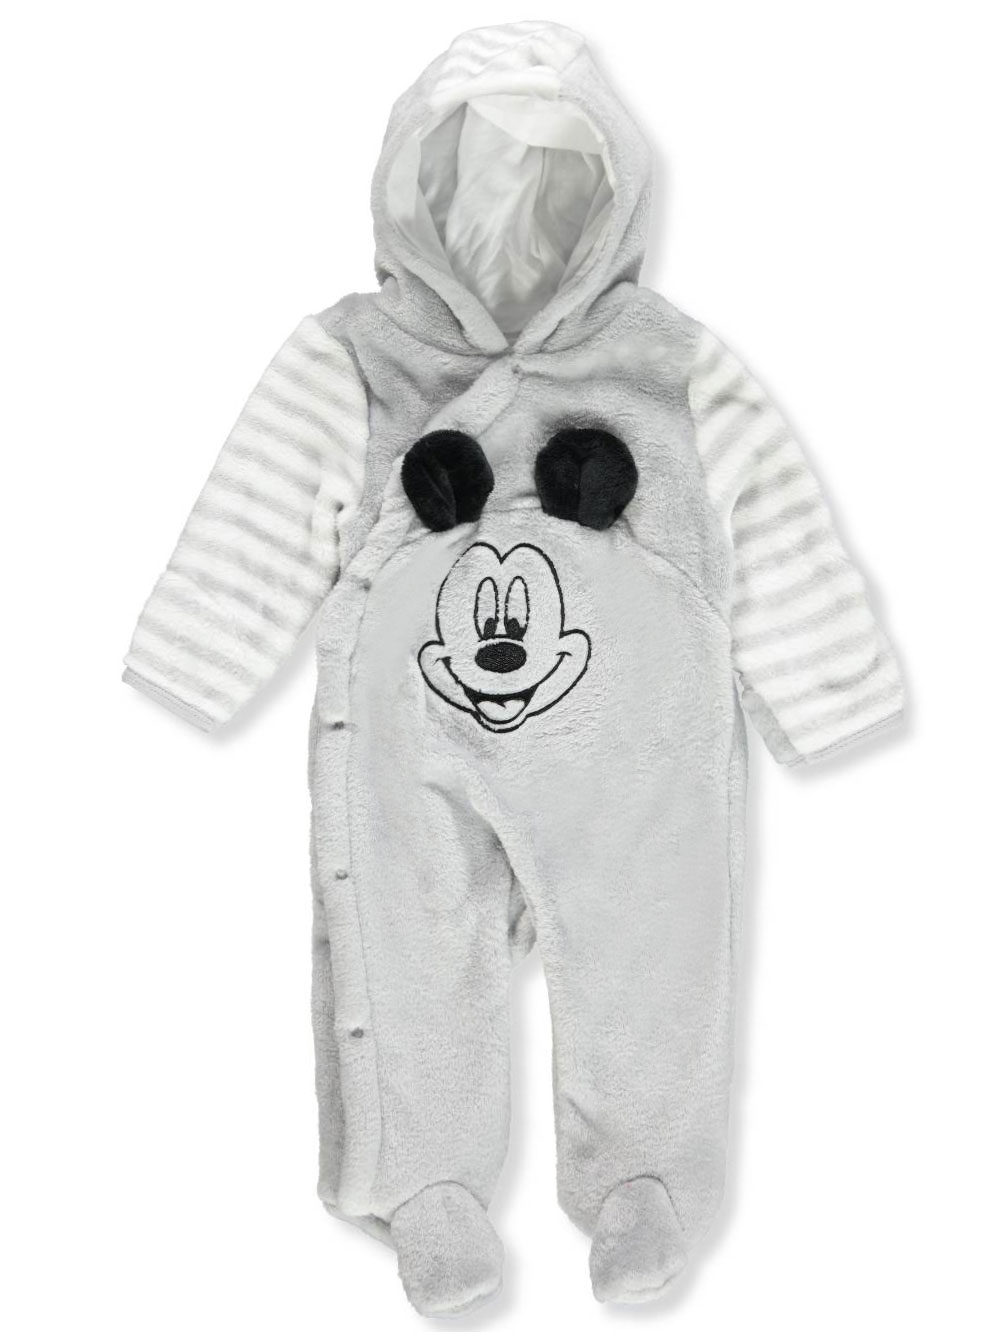 Disney Mickey Mouse Baby Girls' Hooded Pram Suit